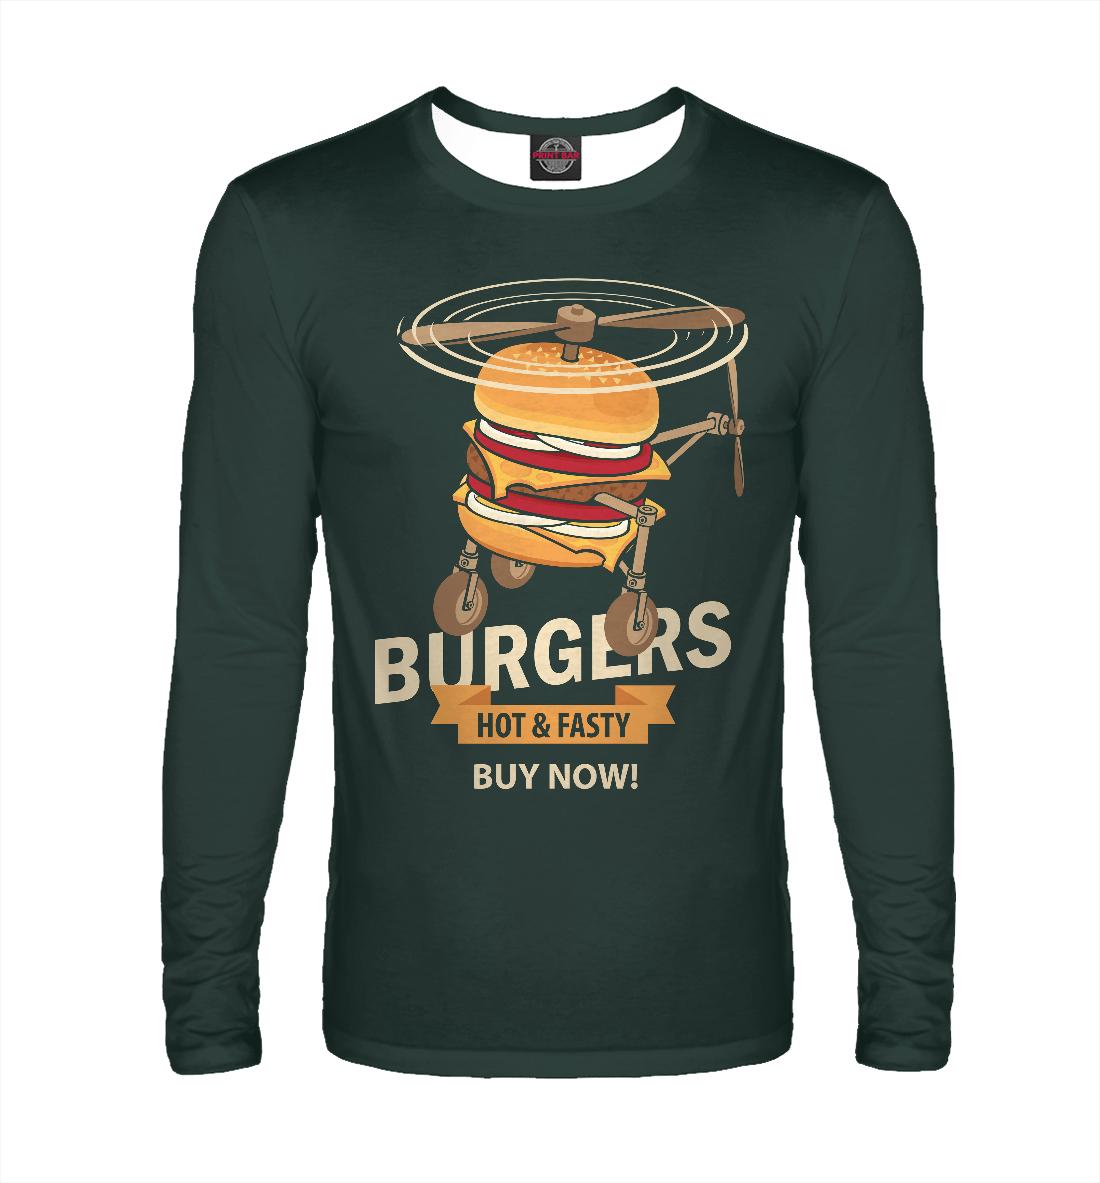 Burgers 8 burgers